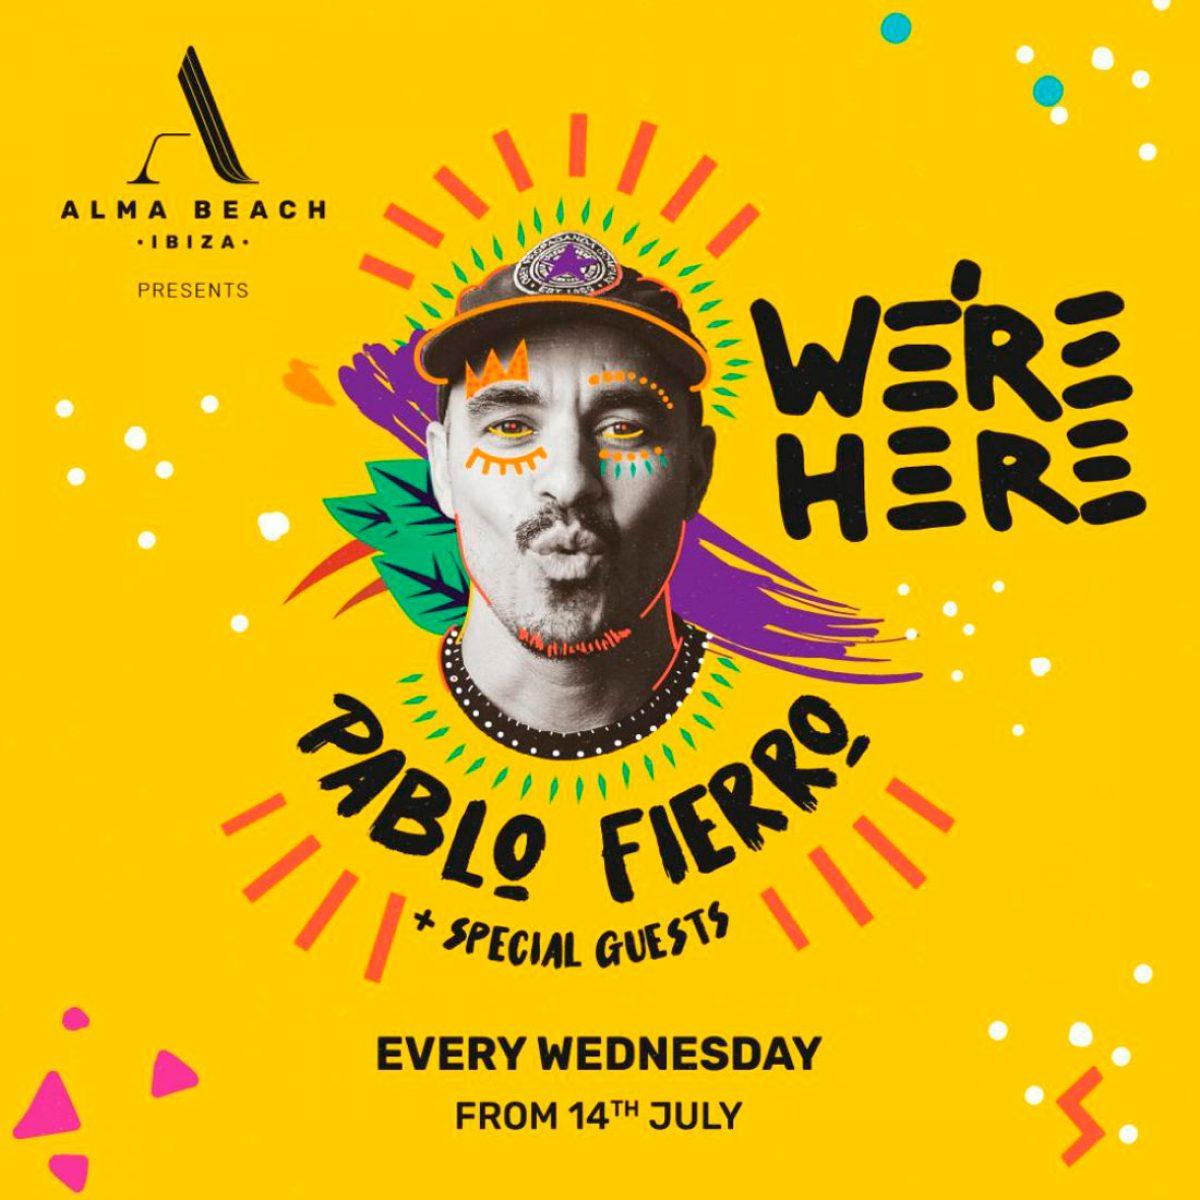 pablo-fierro-were-were-alma-beach-ibiza-2021-welcometoibiza